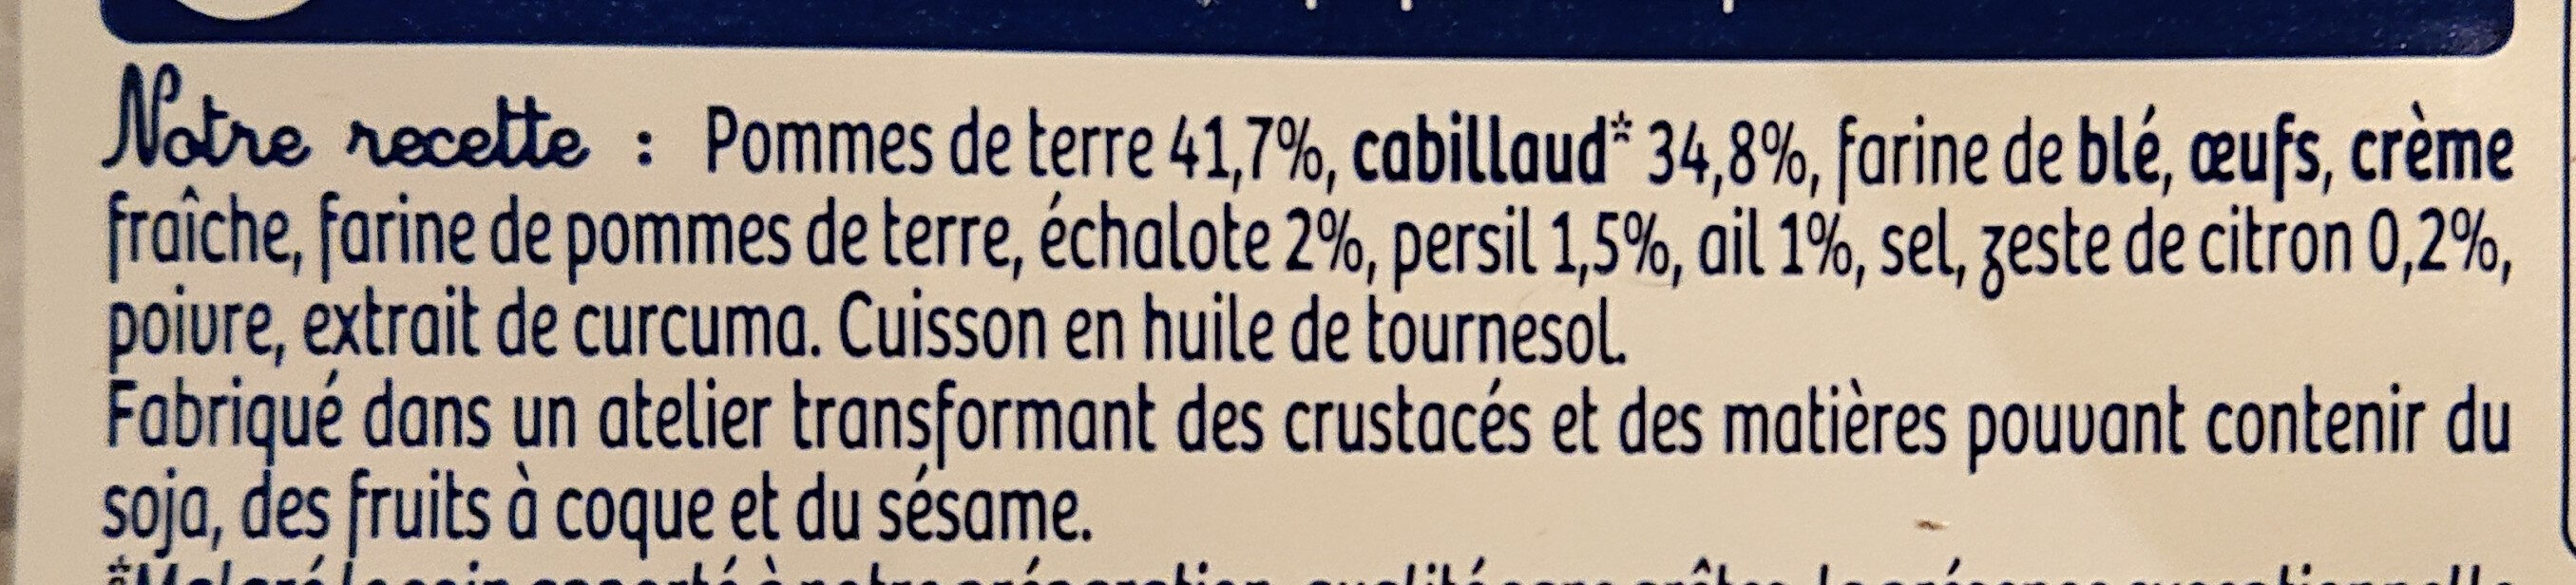 Croques cabillaud - Ingrediënten - fr